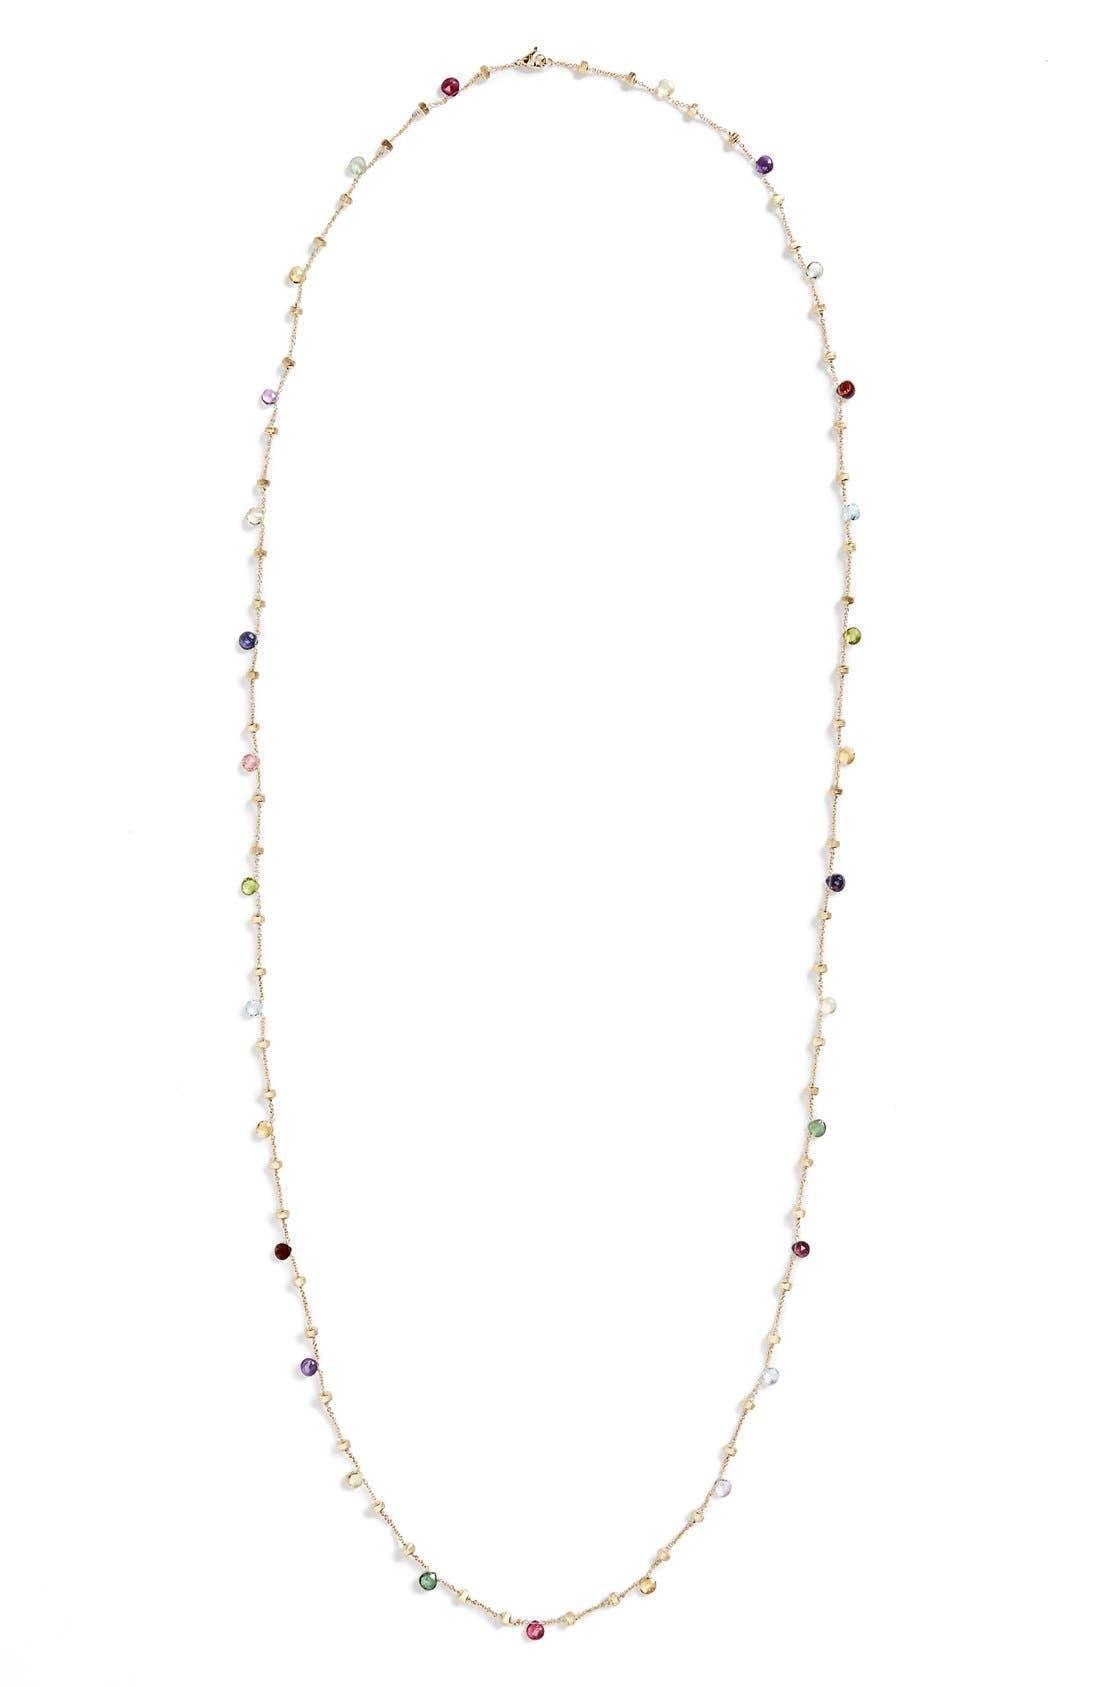 'Paradise' Semiprecious Stone Long Necklace,                             Alternate thumbnail 3, color,                             YELLOW GOLD/ MULTI